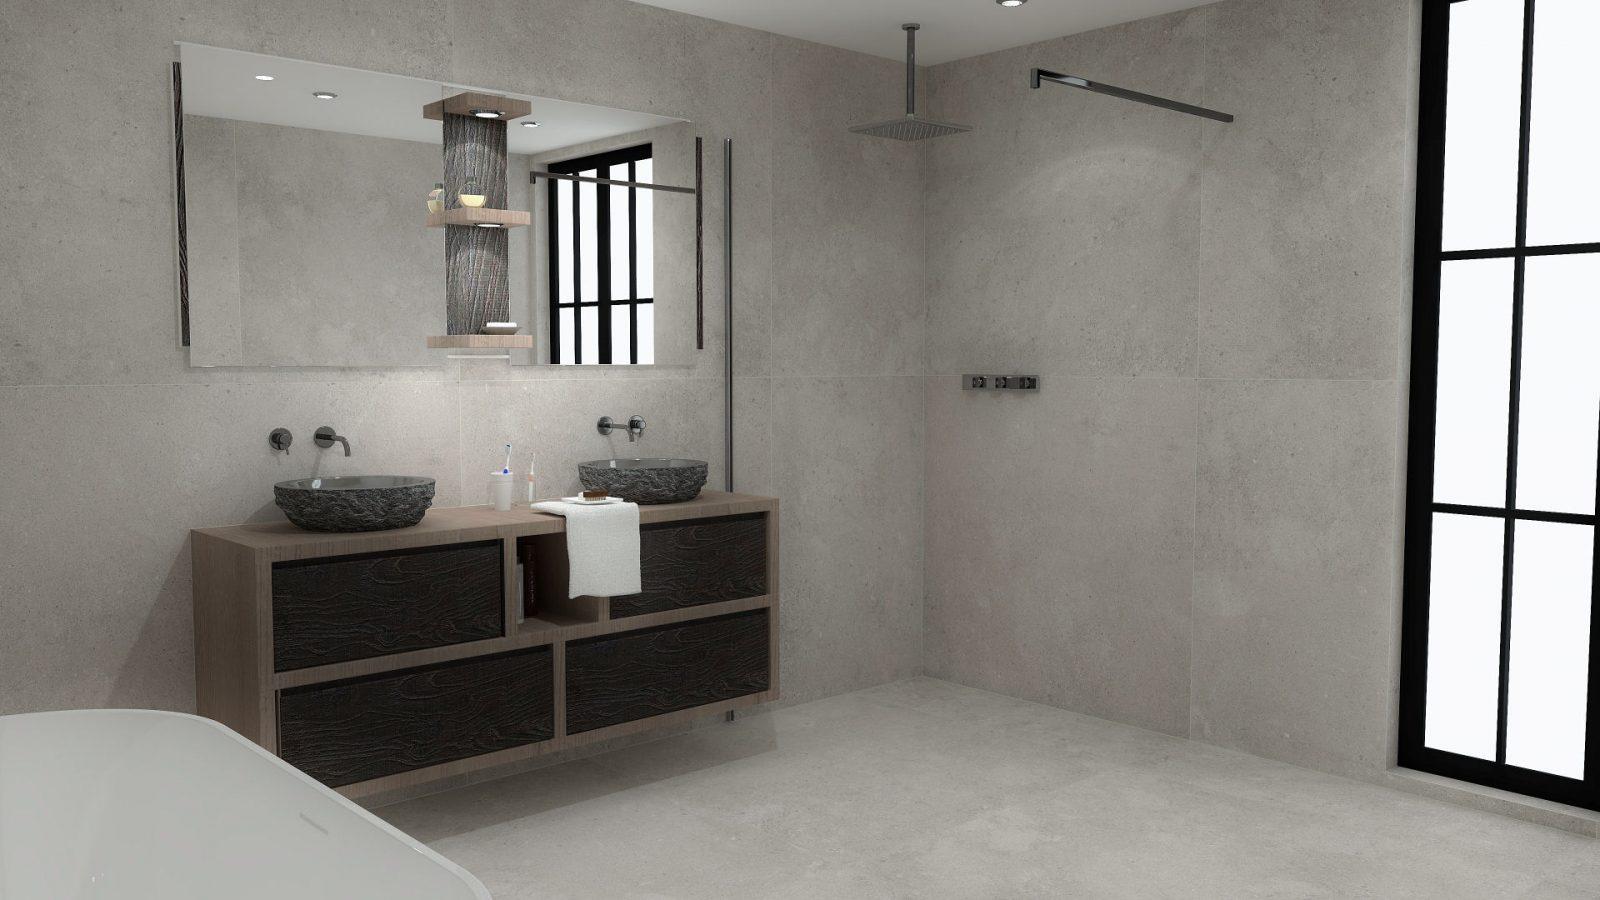 Goedkope Badkamermeubels Rotterdam : Badkamer toilet of douche vernieuwen? badkamerhuis!